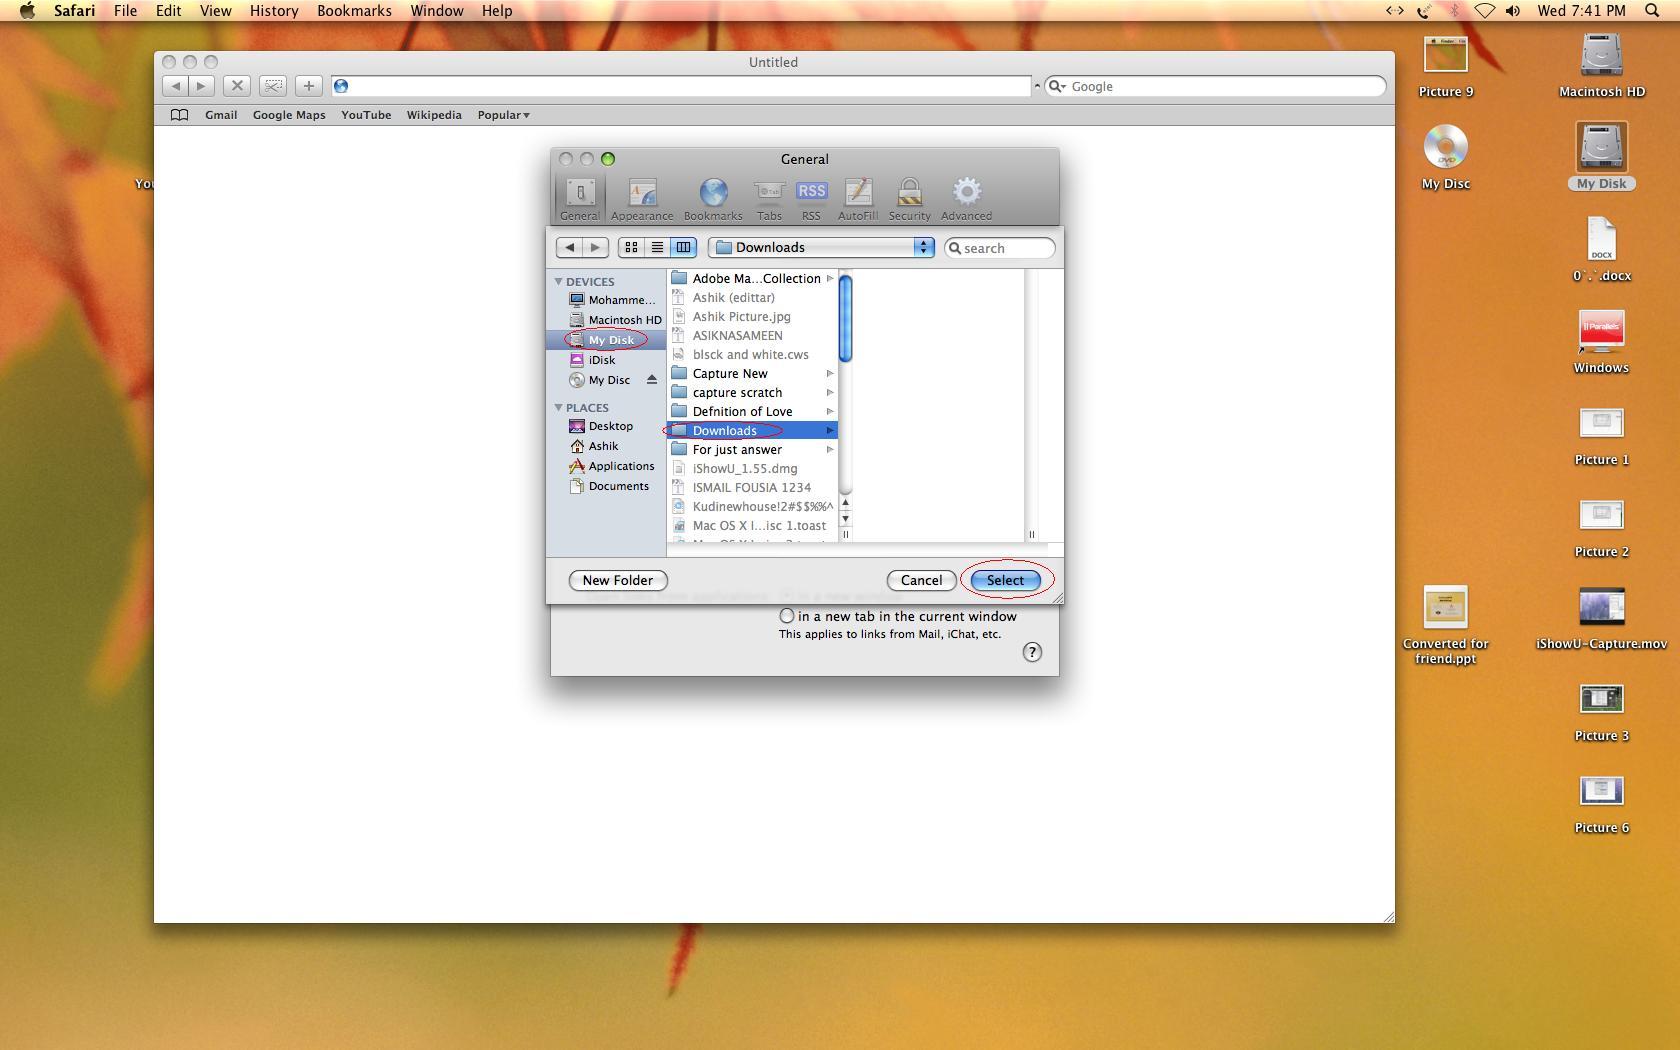 unable to download pdf files in safari